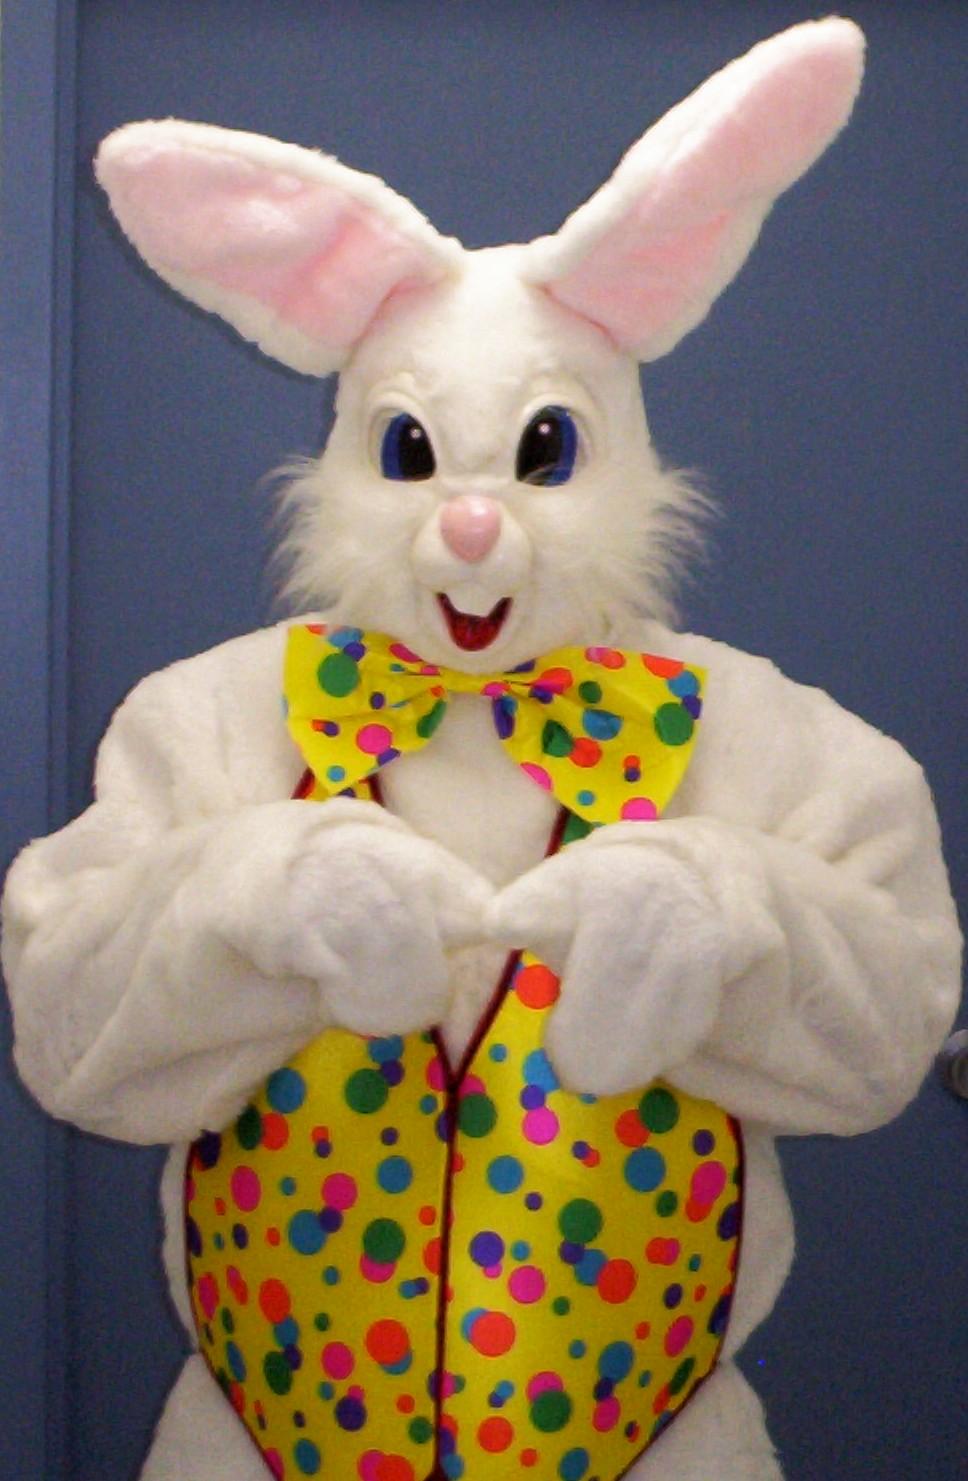 Scary Easter Bunny Photos Evil easter bu... scary rabbit